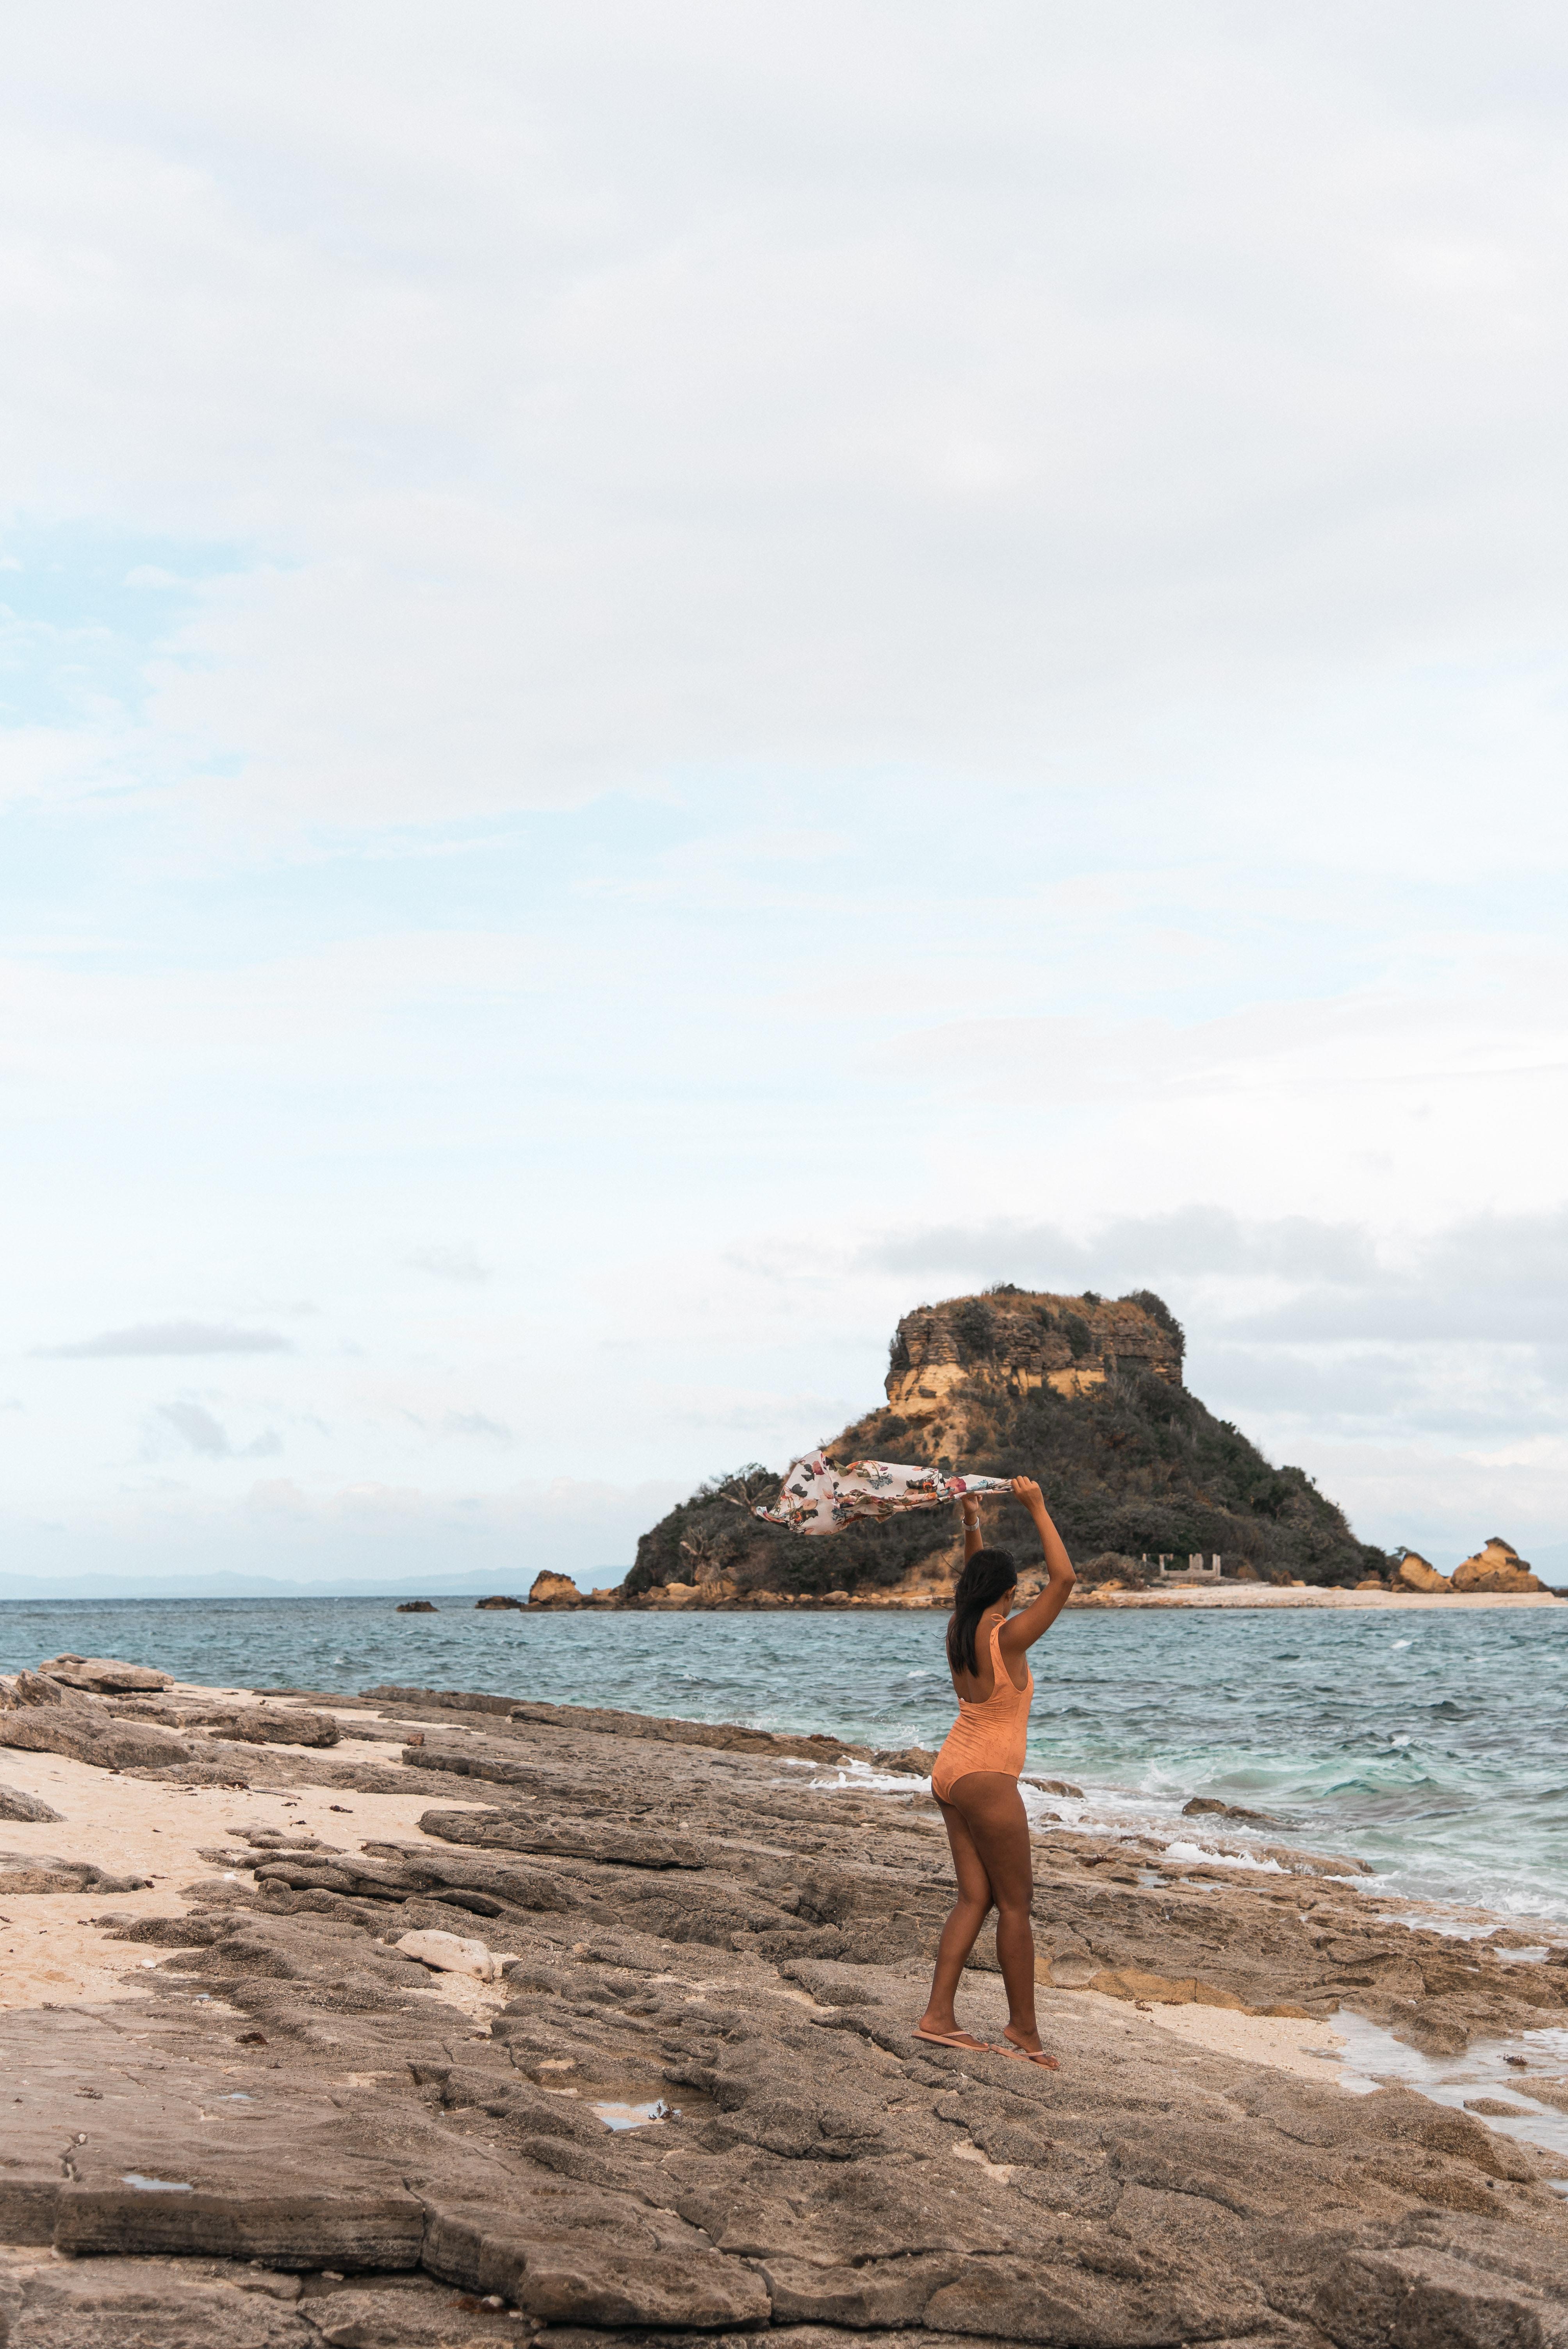 Sombrero Island Masbate, Burias Island tour, Burias Island travel guide, Sombrero Island, Sombrero Island Travel Guide